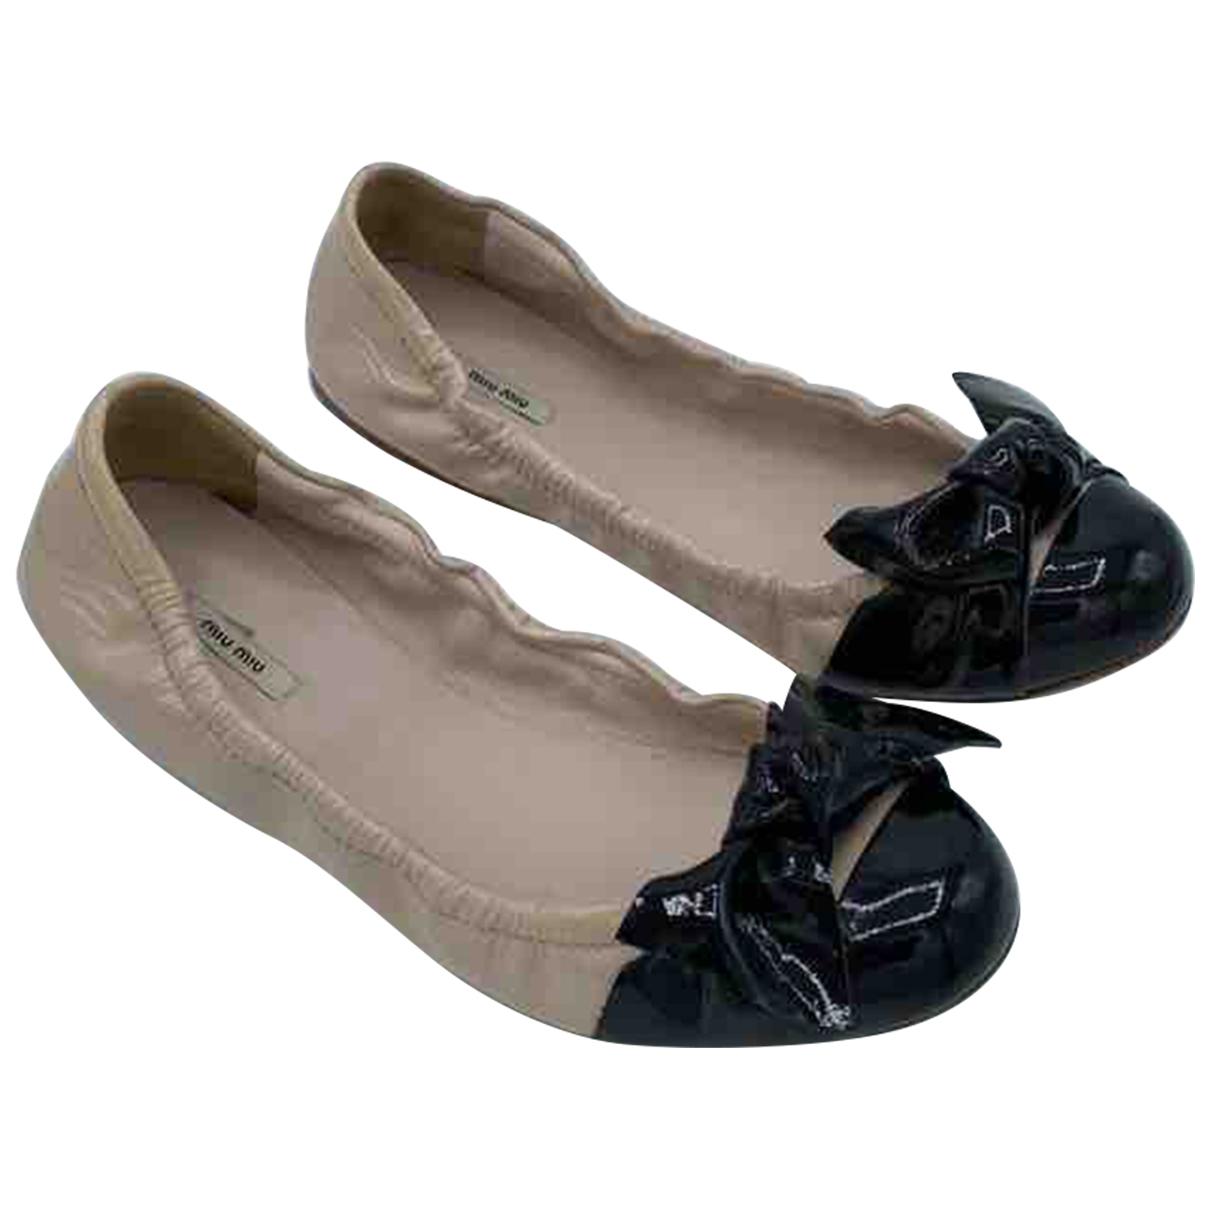 Miu Miu \N Beige Patent leather Ballet flats for Women 37 EU